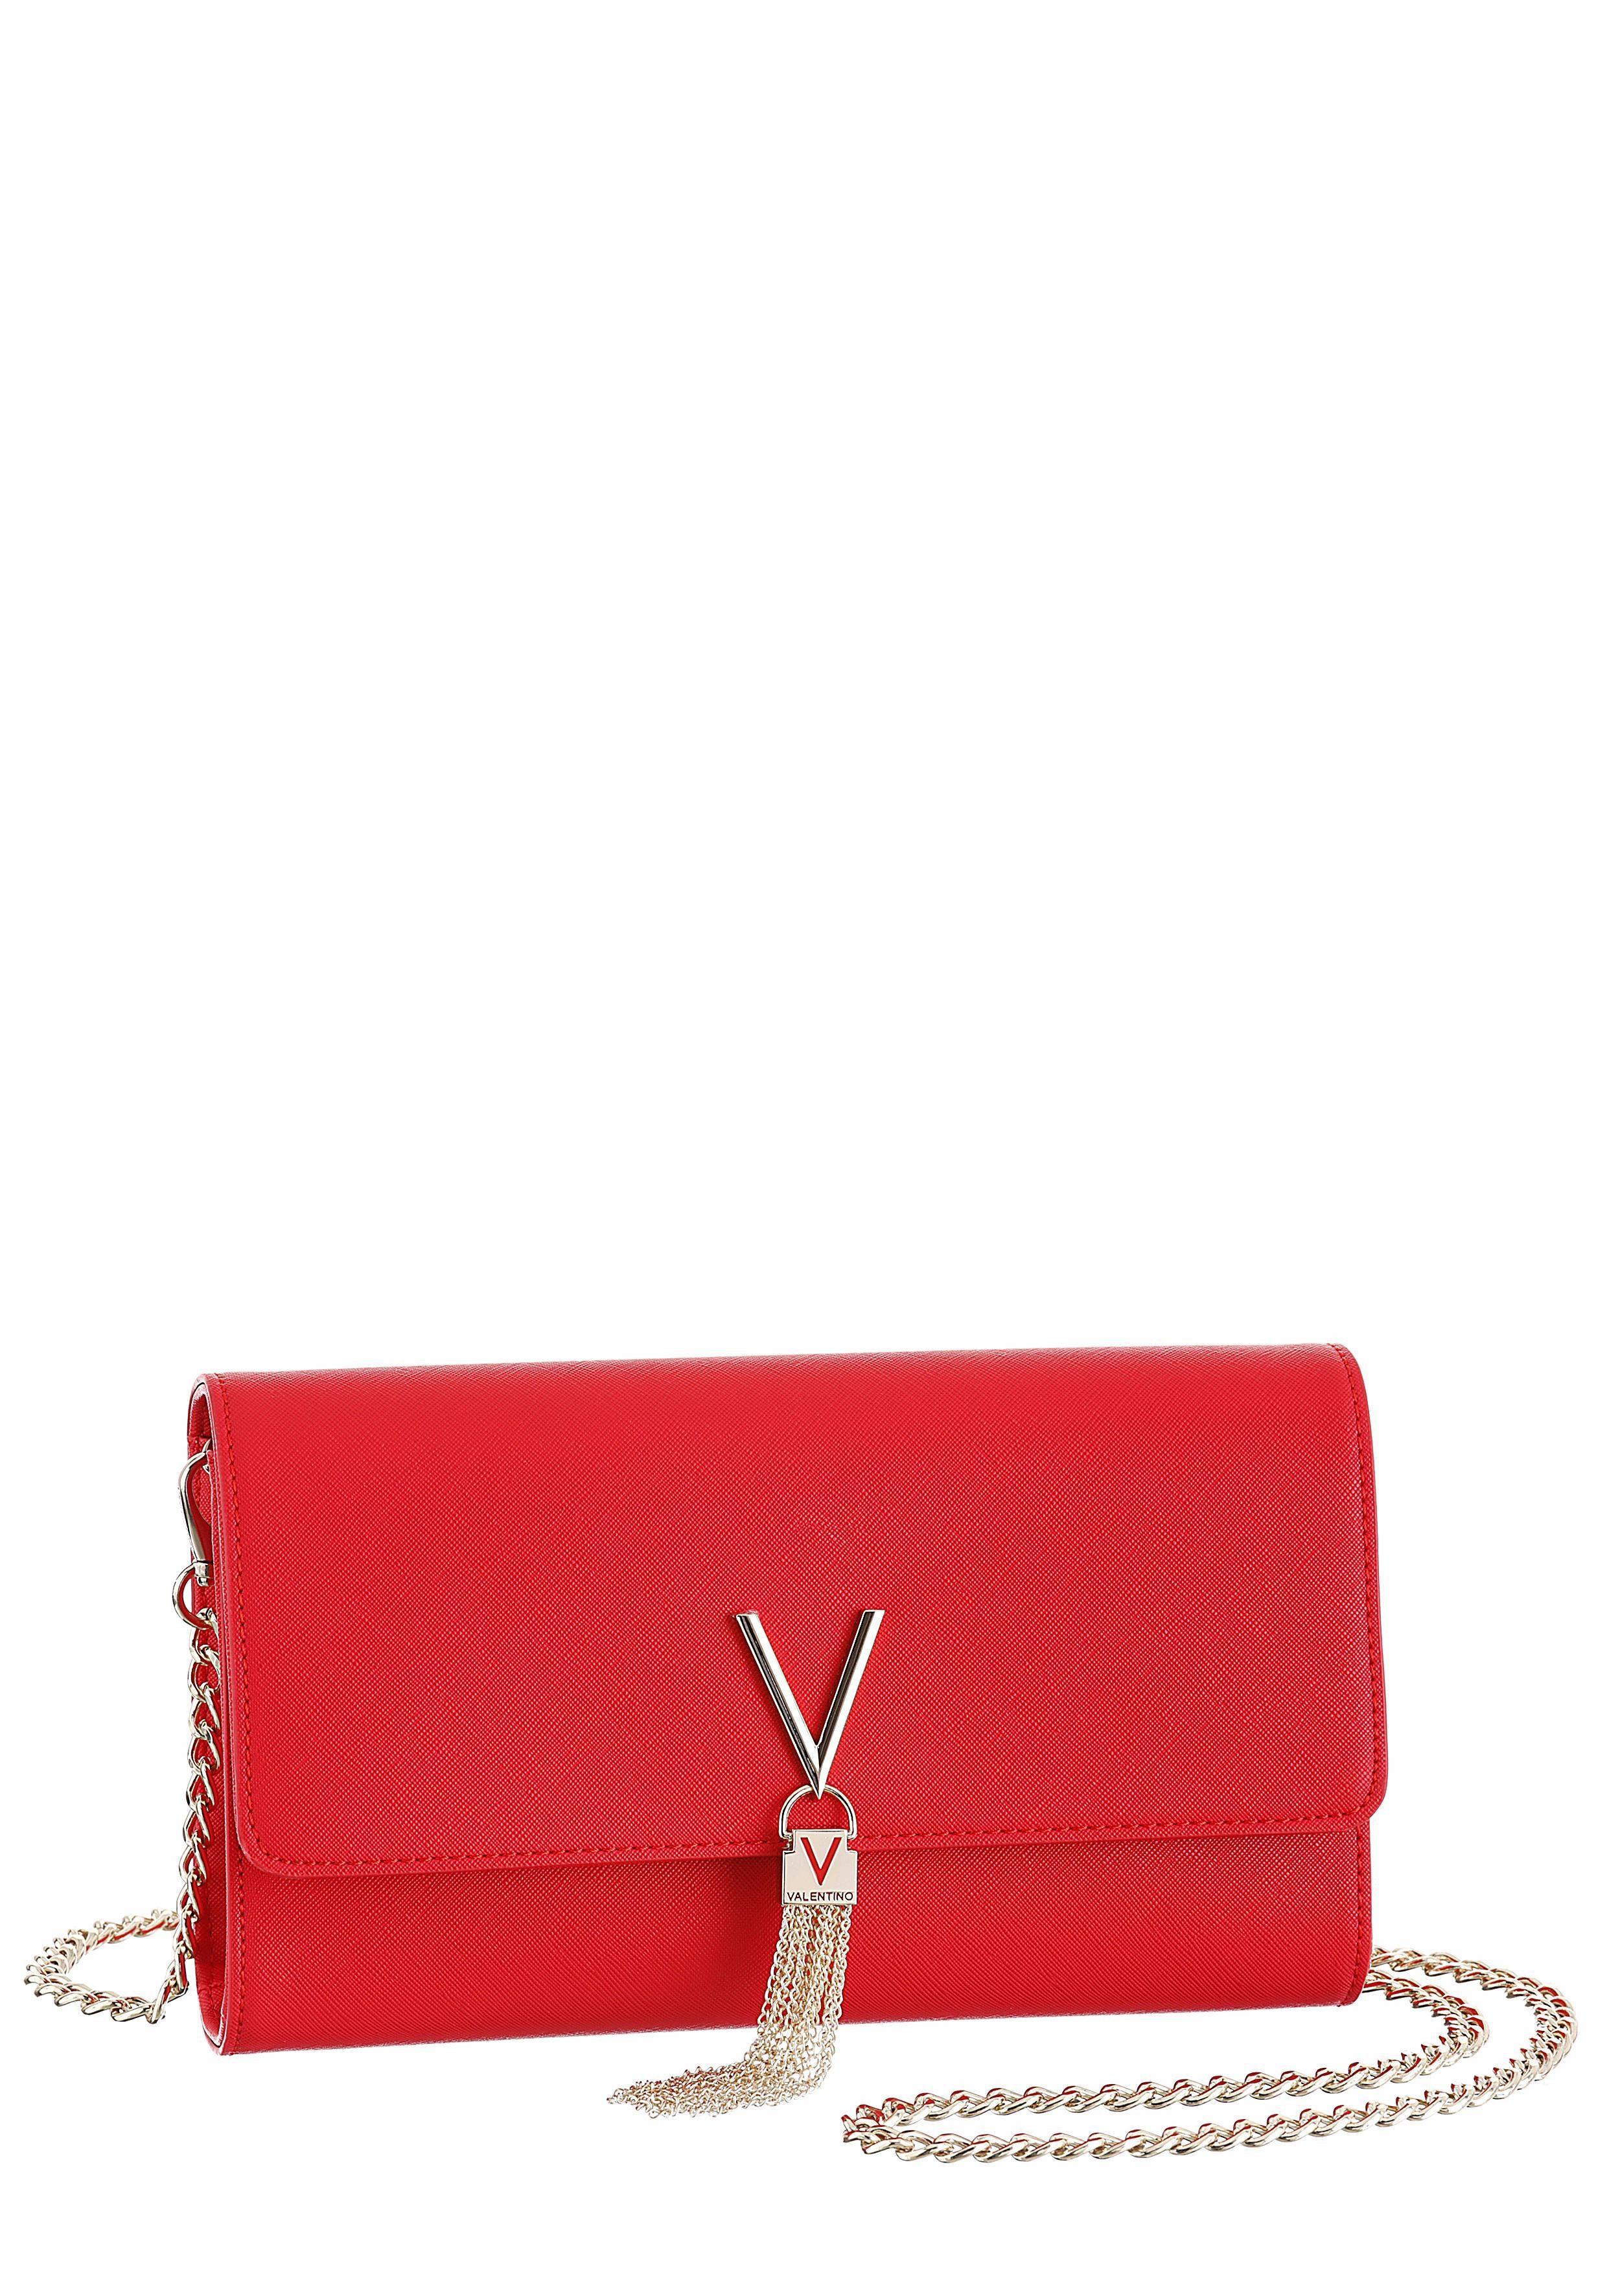 Valentino handbags Clutch »DIVINA SA«